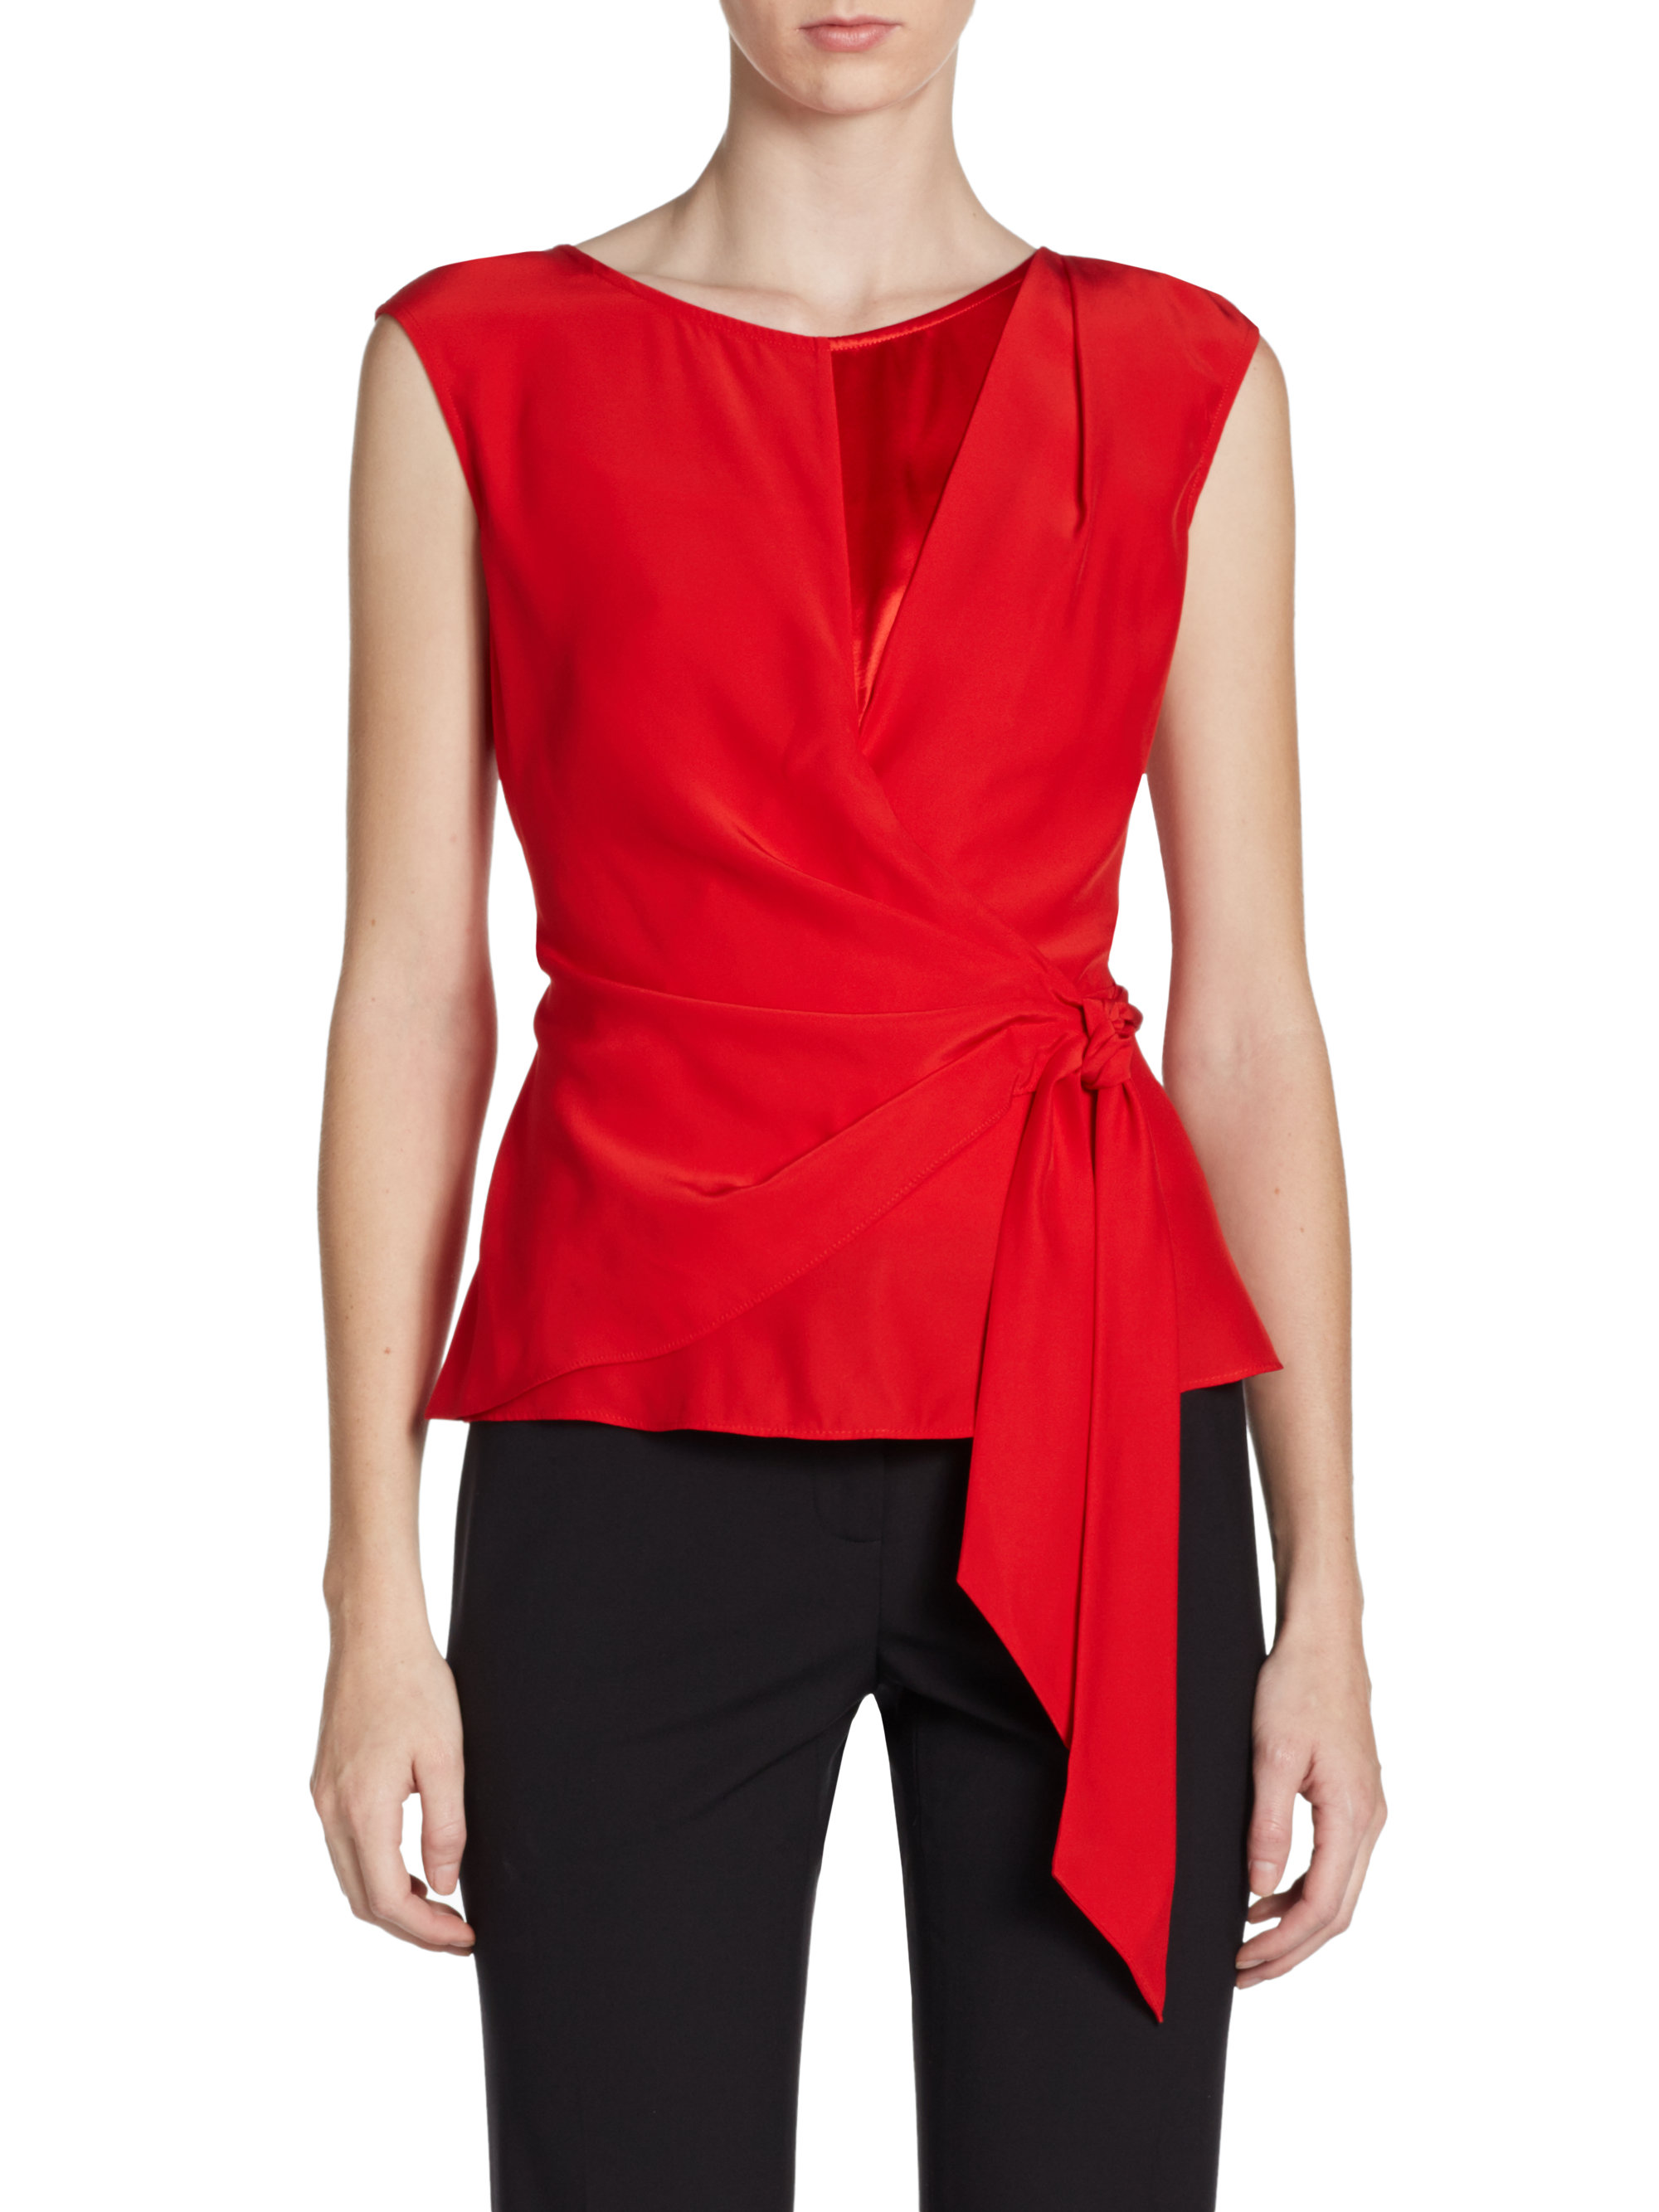 148 Best Images About Fingernail Art On Pinterest: Lafayette 148 New York Side Tie Silk Top In Red